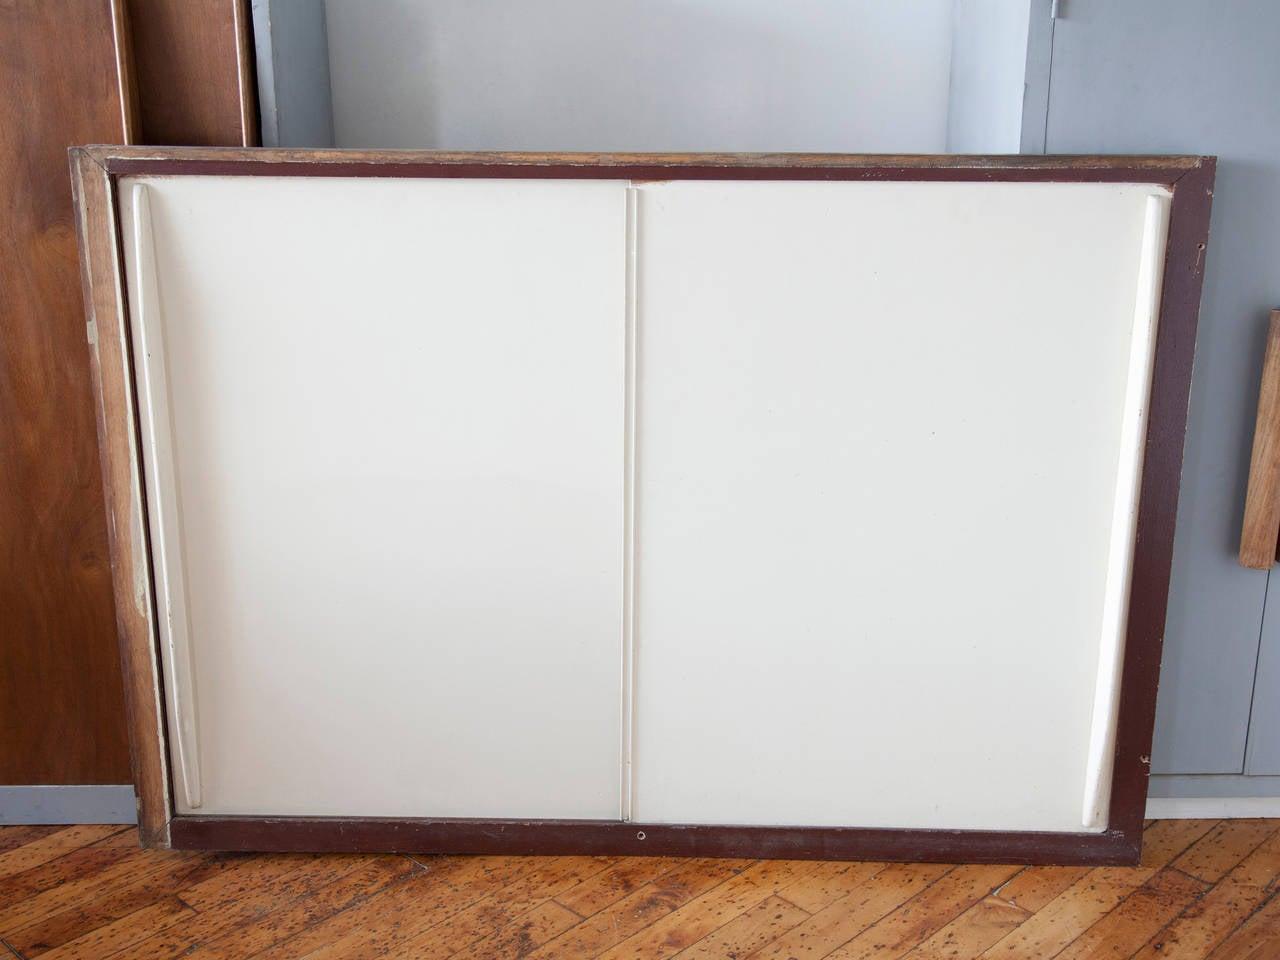 Jean Prouvé Sliding Cabinet Doors in Frames 7